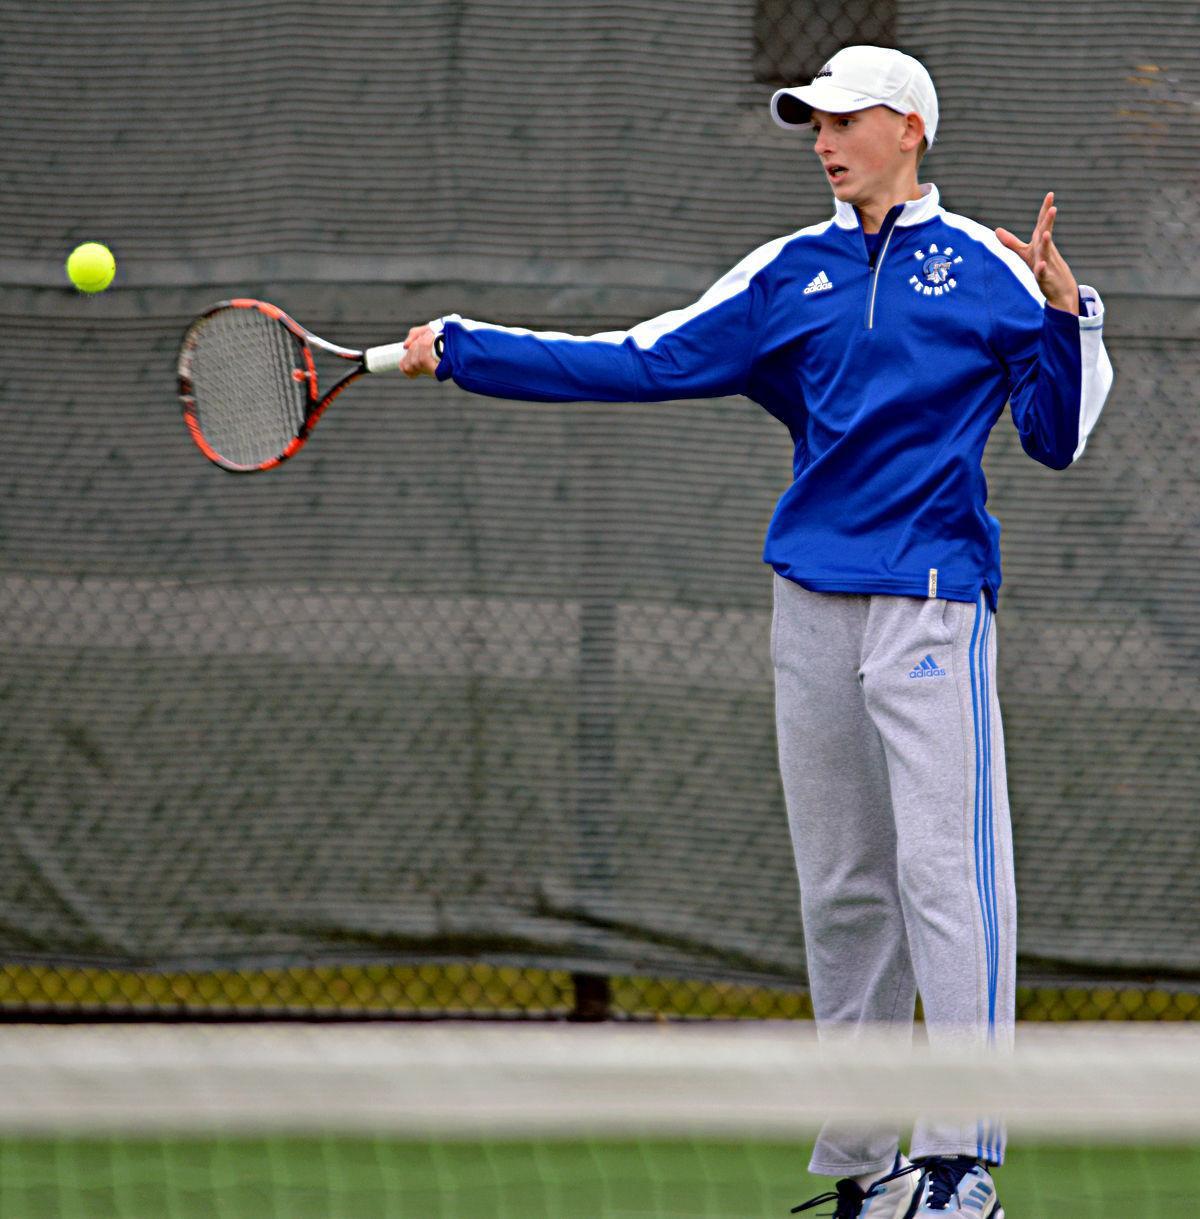 Class A boys state tennis, 10/12/17